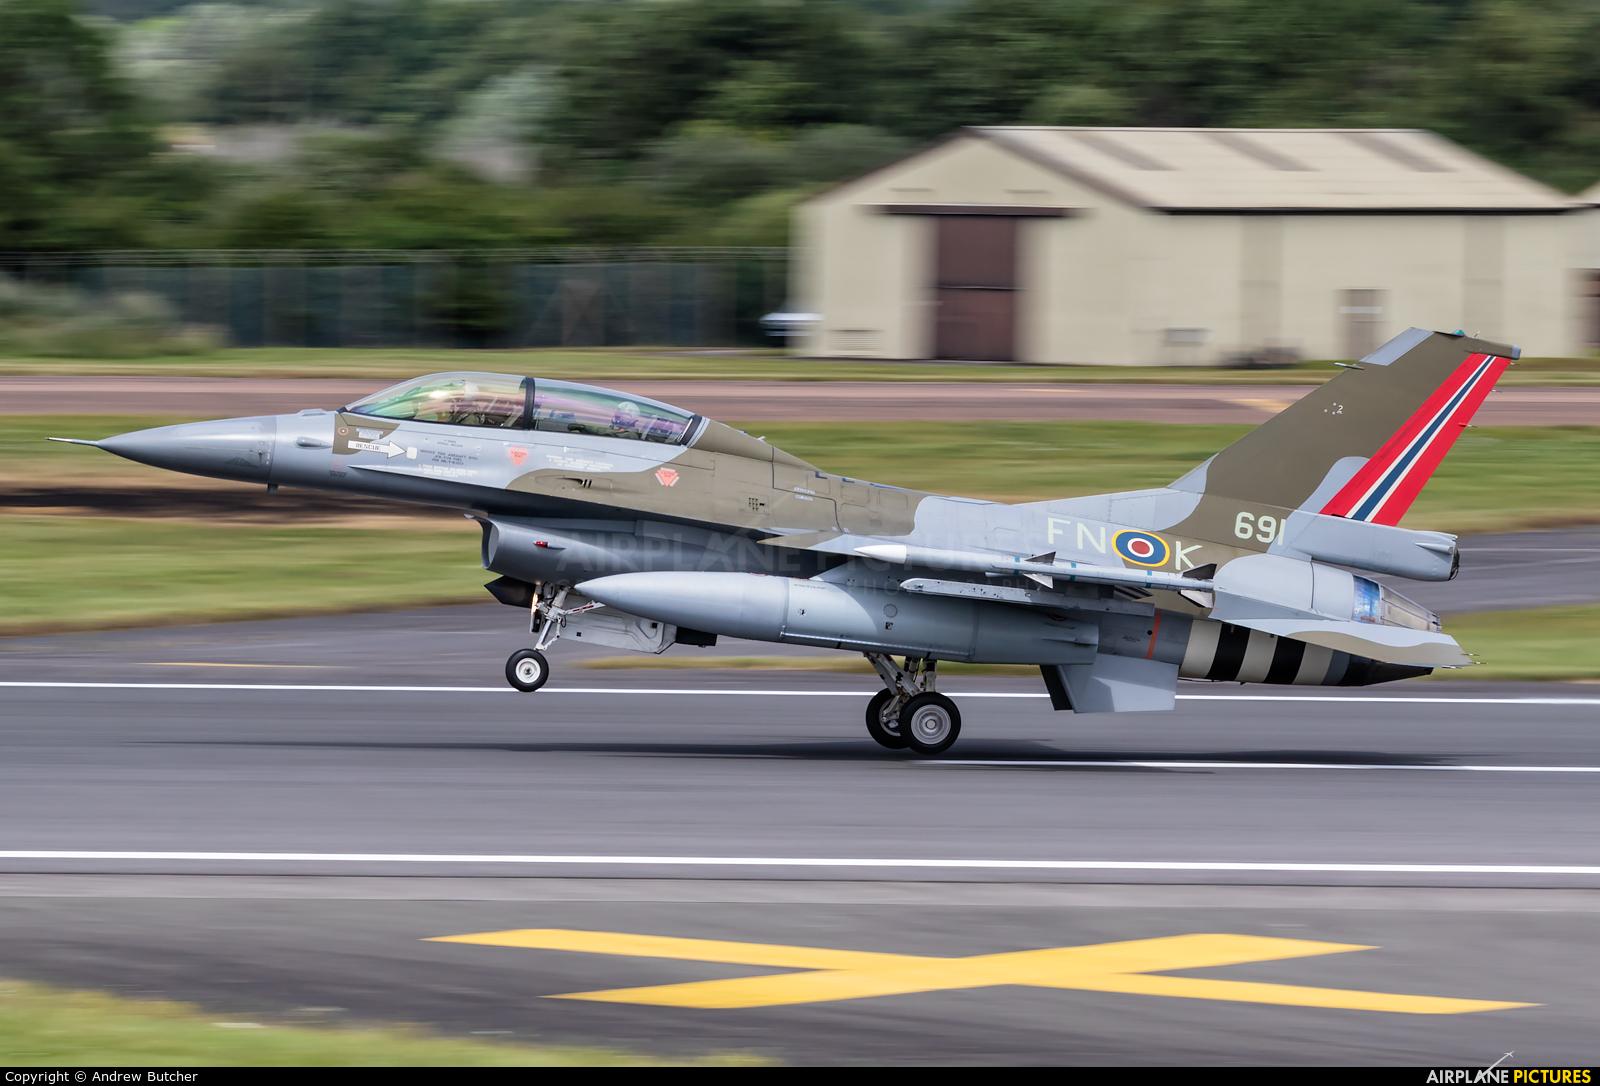 Norway - Royal Norwegian Air Force 691 aircraft at Fairford